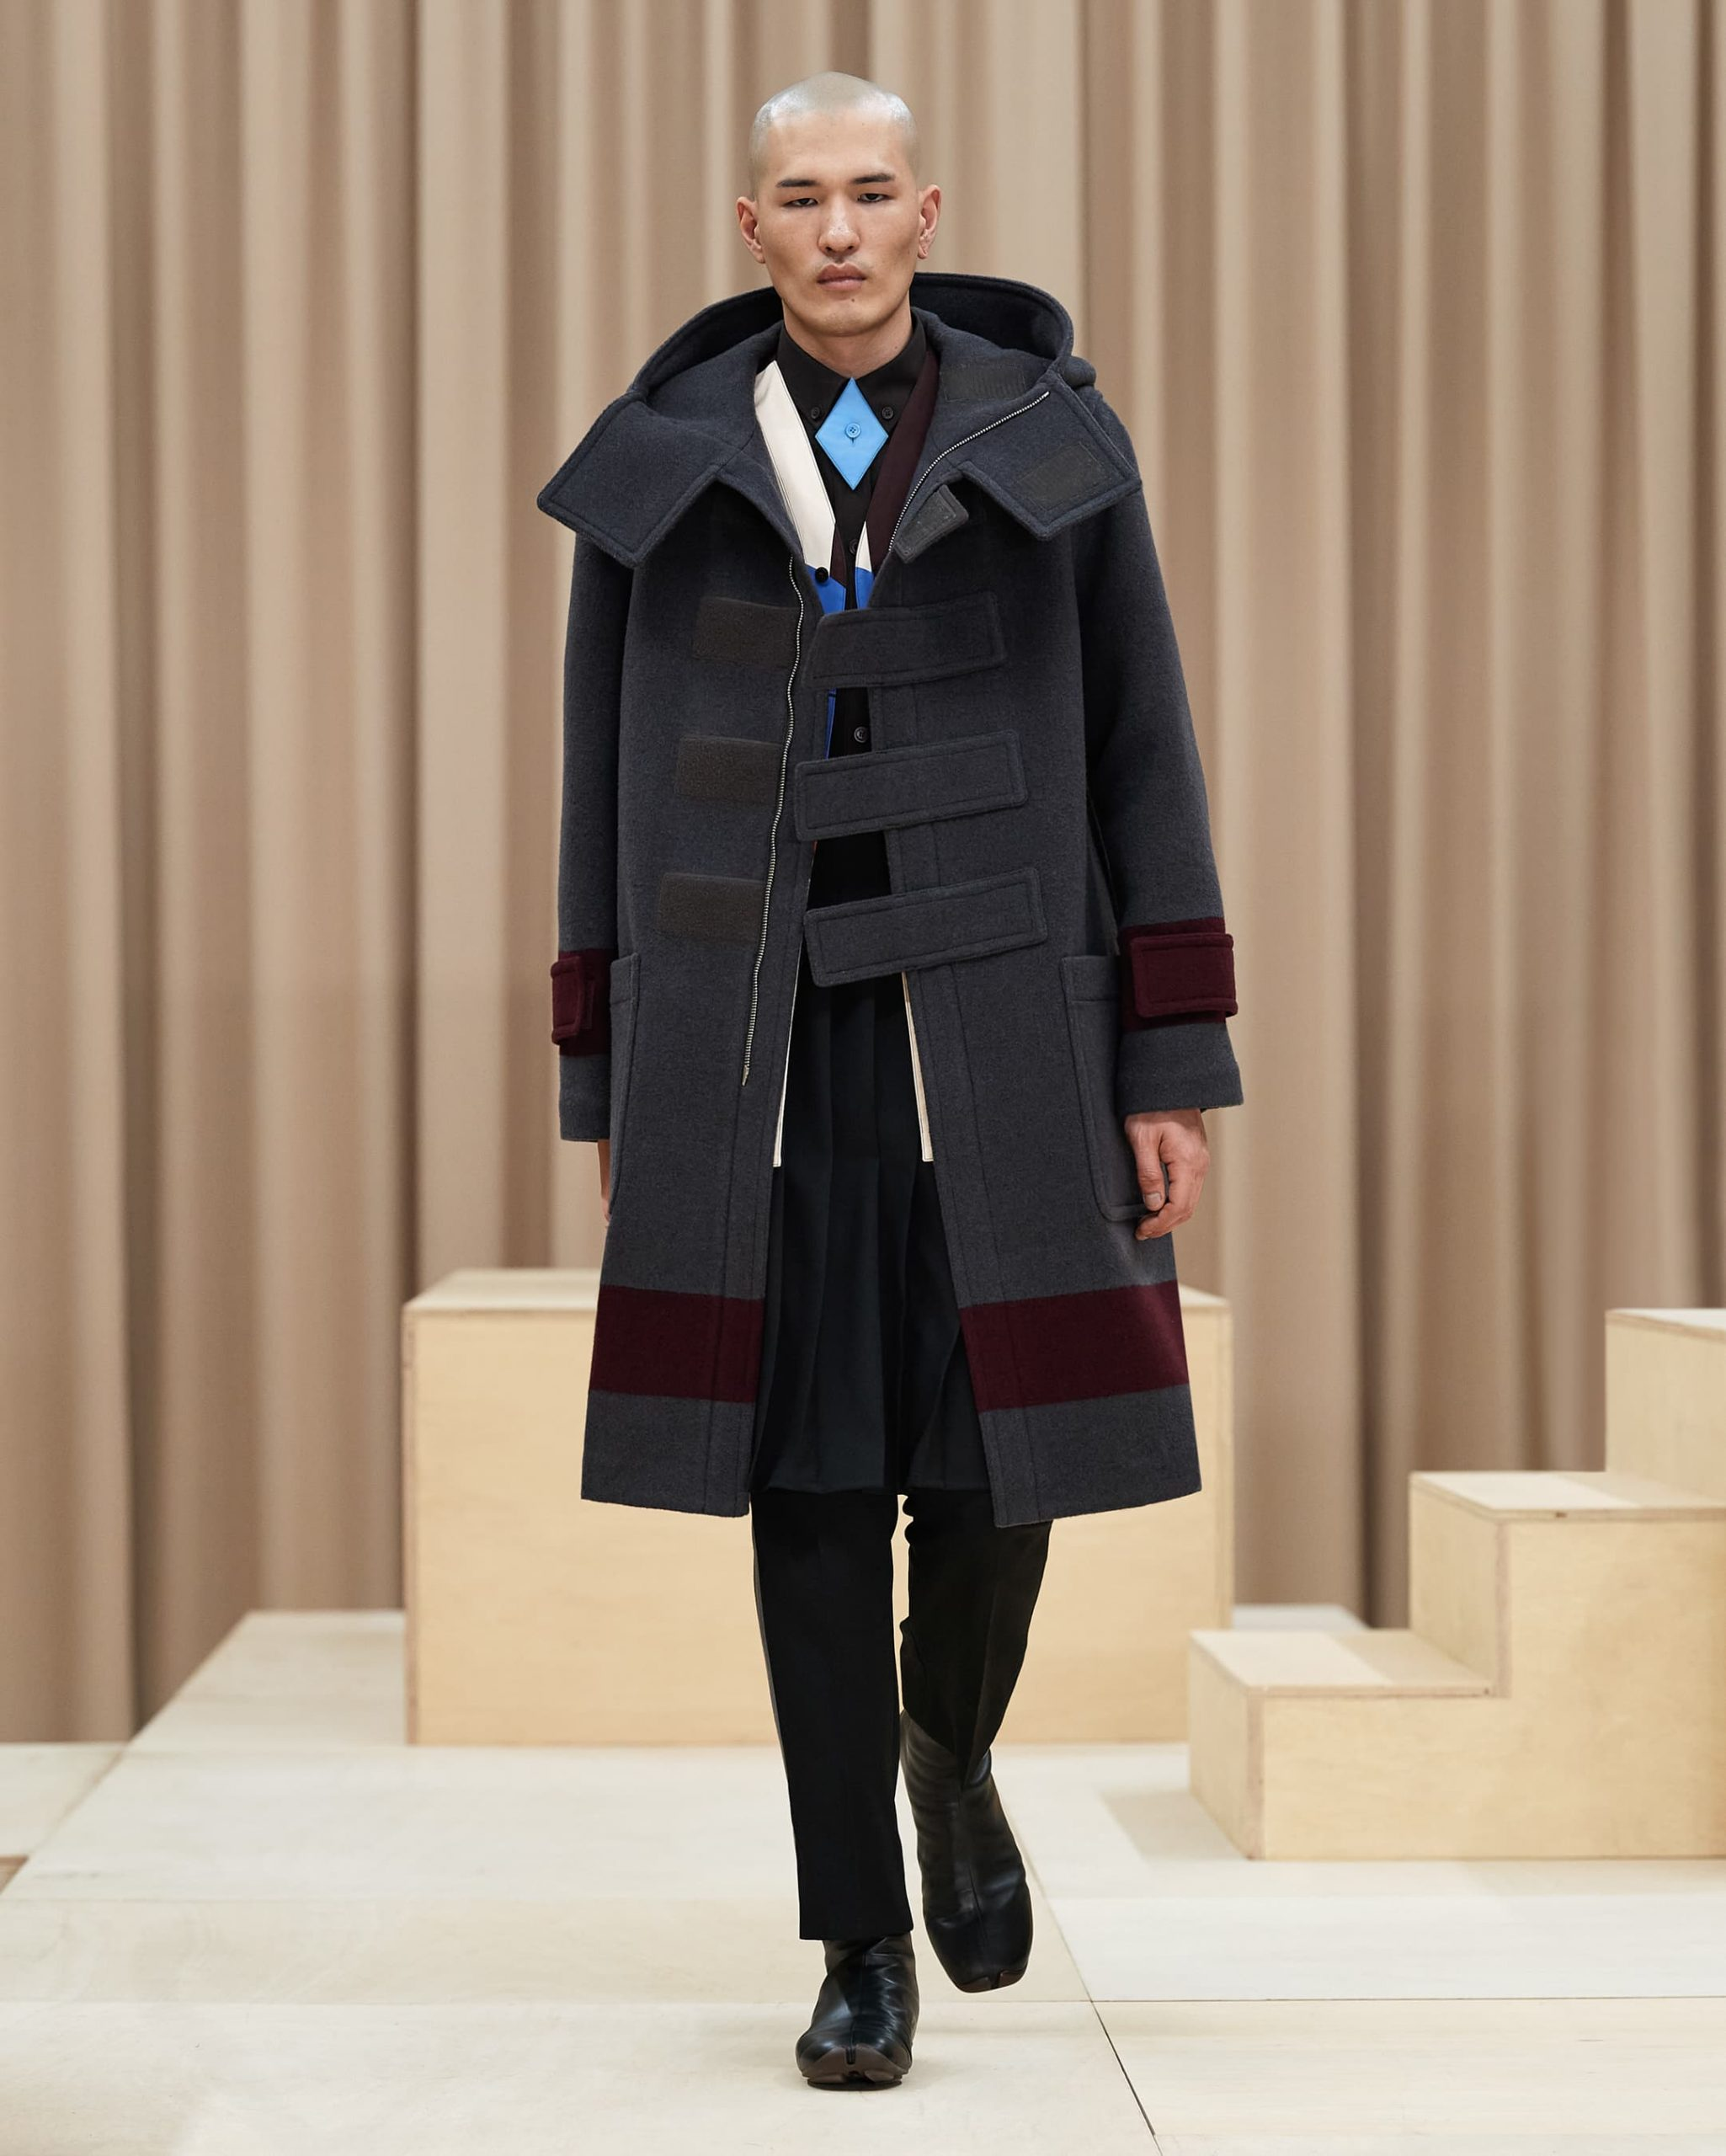 Burberry Men's Fall 2021 Fashion Show Review